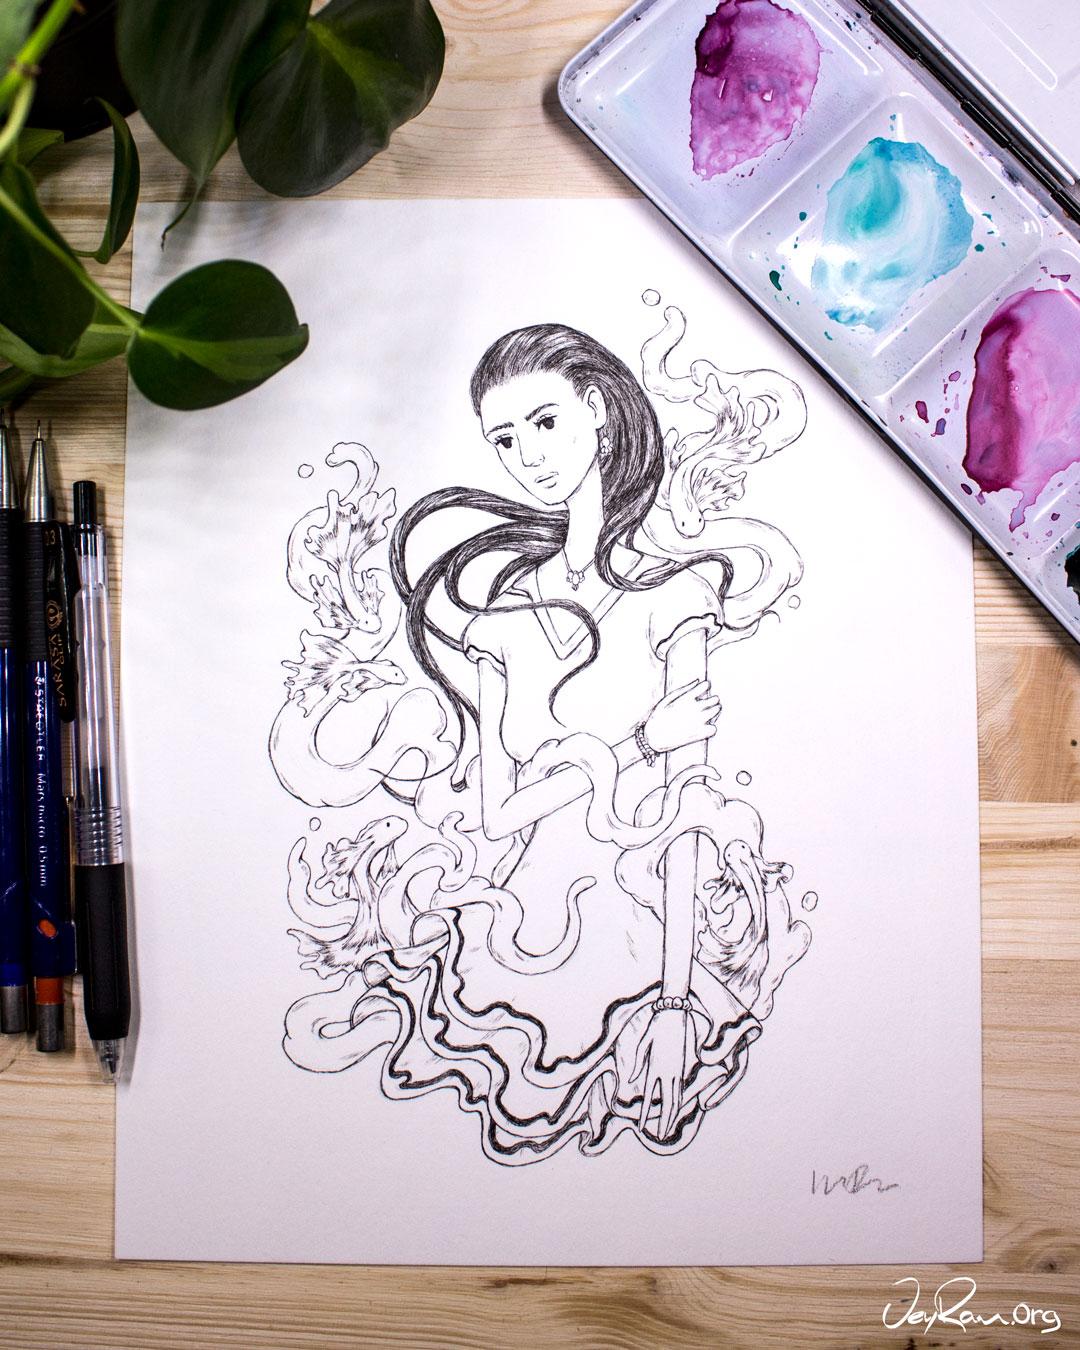 Copy of Ballpoint pen + Watercolor art by JeyRam #Drawing #Art #Illustration #JeyRam